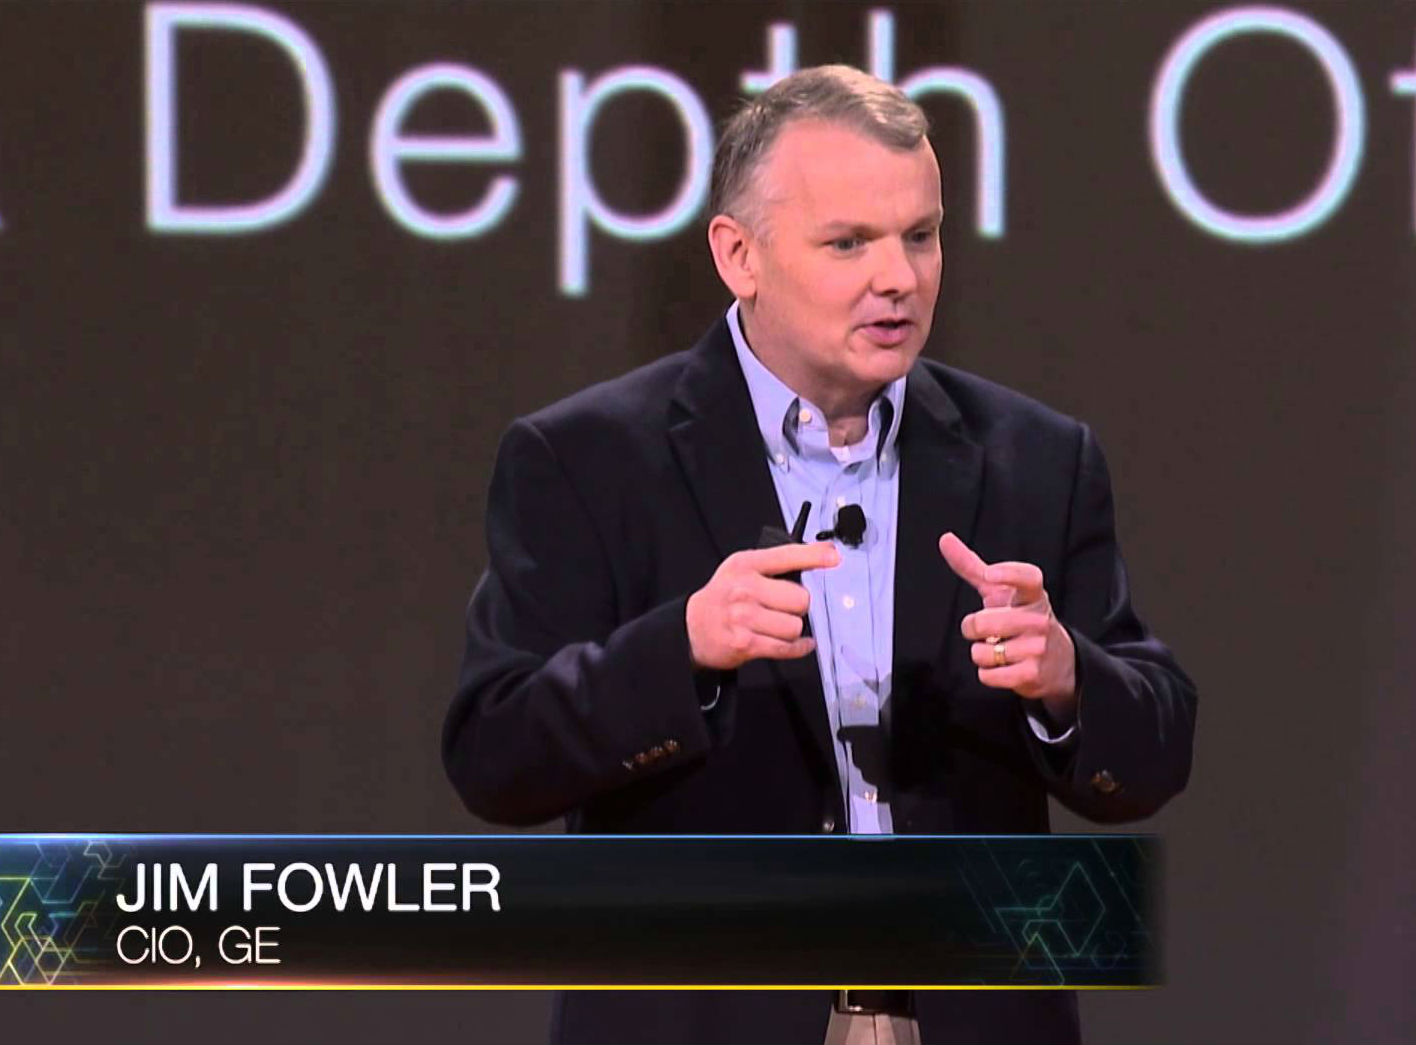 Jim Fowler, CIO of General Electric